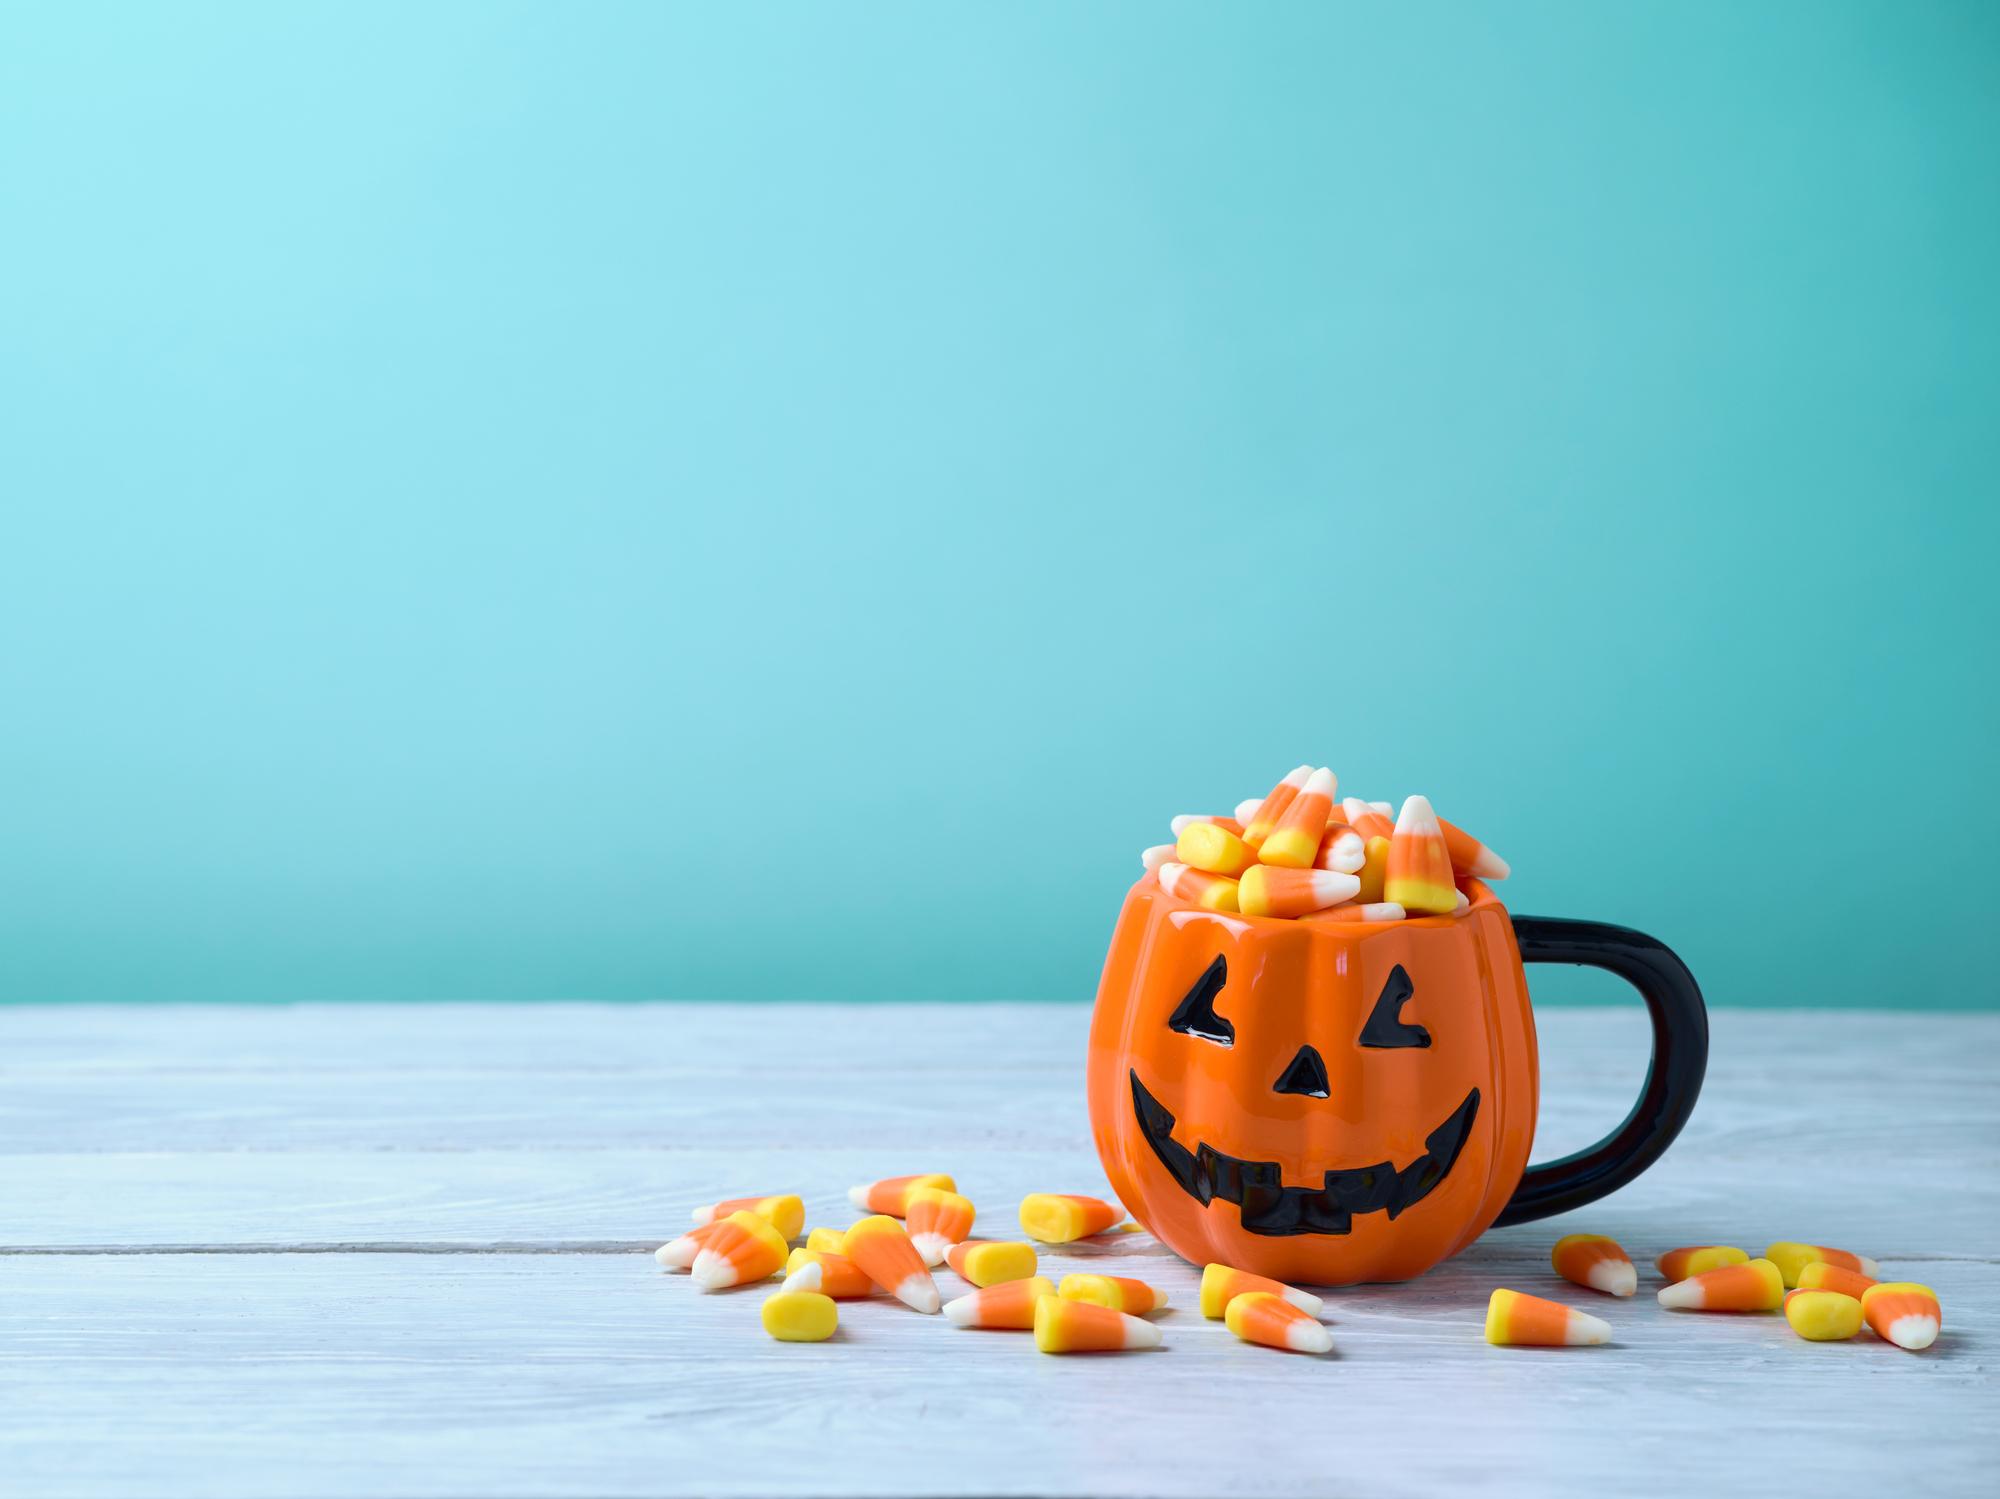 A jack-o-lantern mug is filled with candy corn.